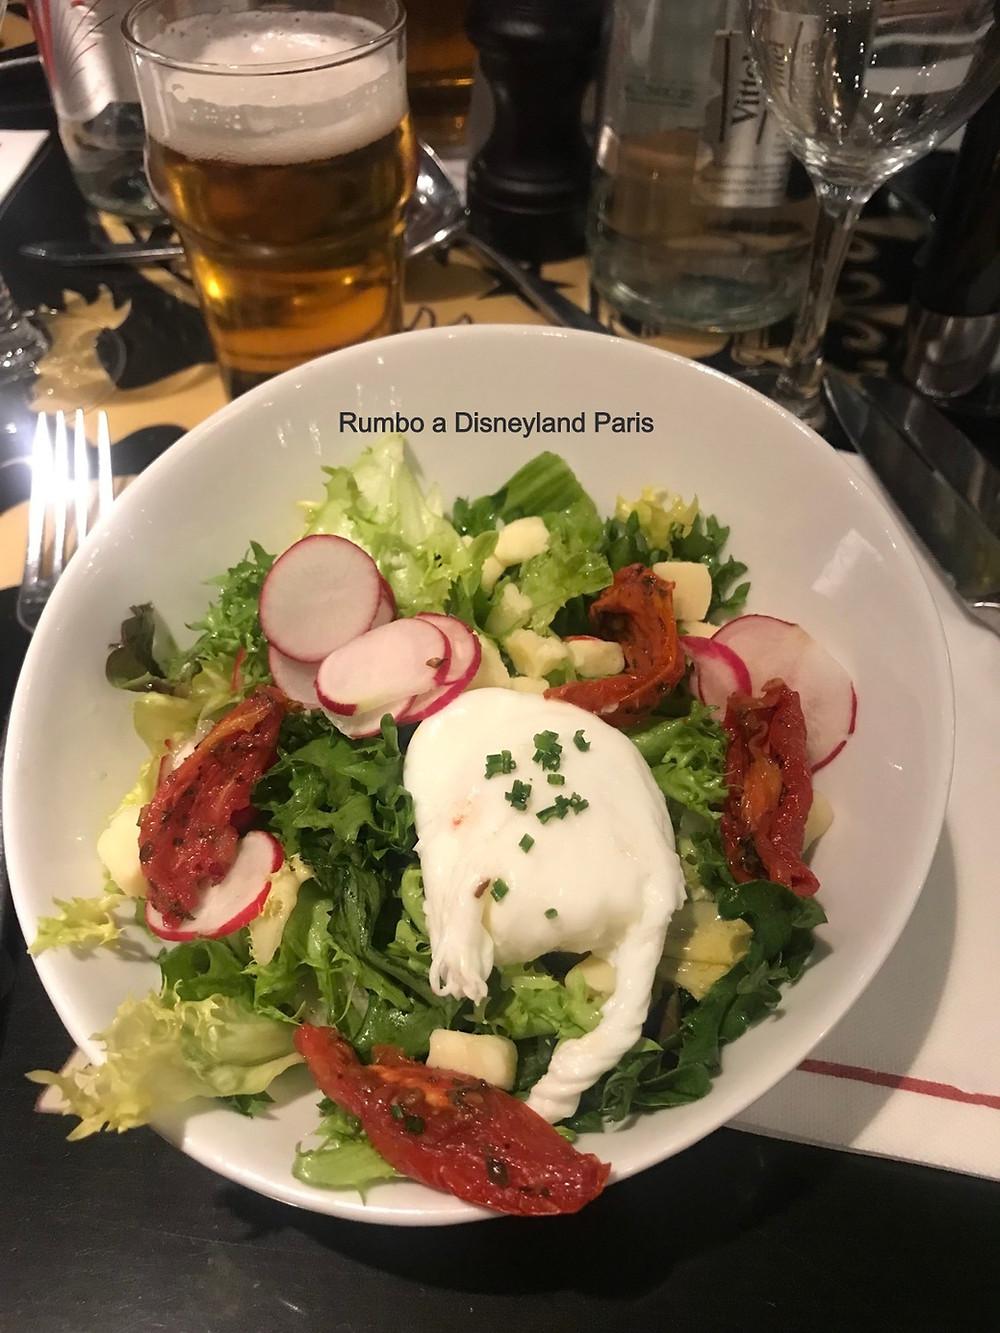 Bistrot chez Rémy en Walt Disney Studios opinion experiencia comida Restaurante Ratatouille